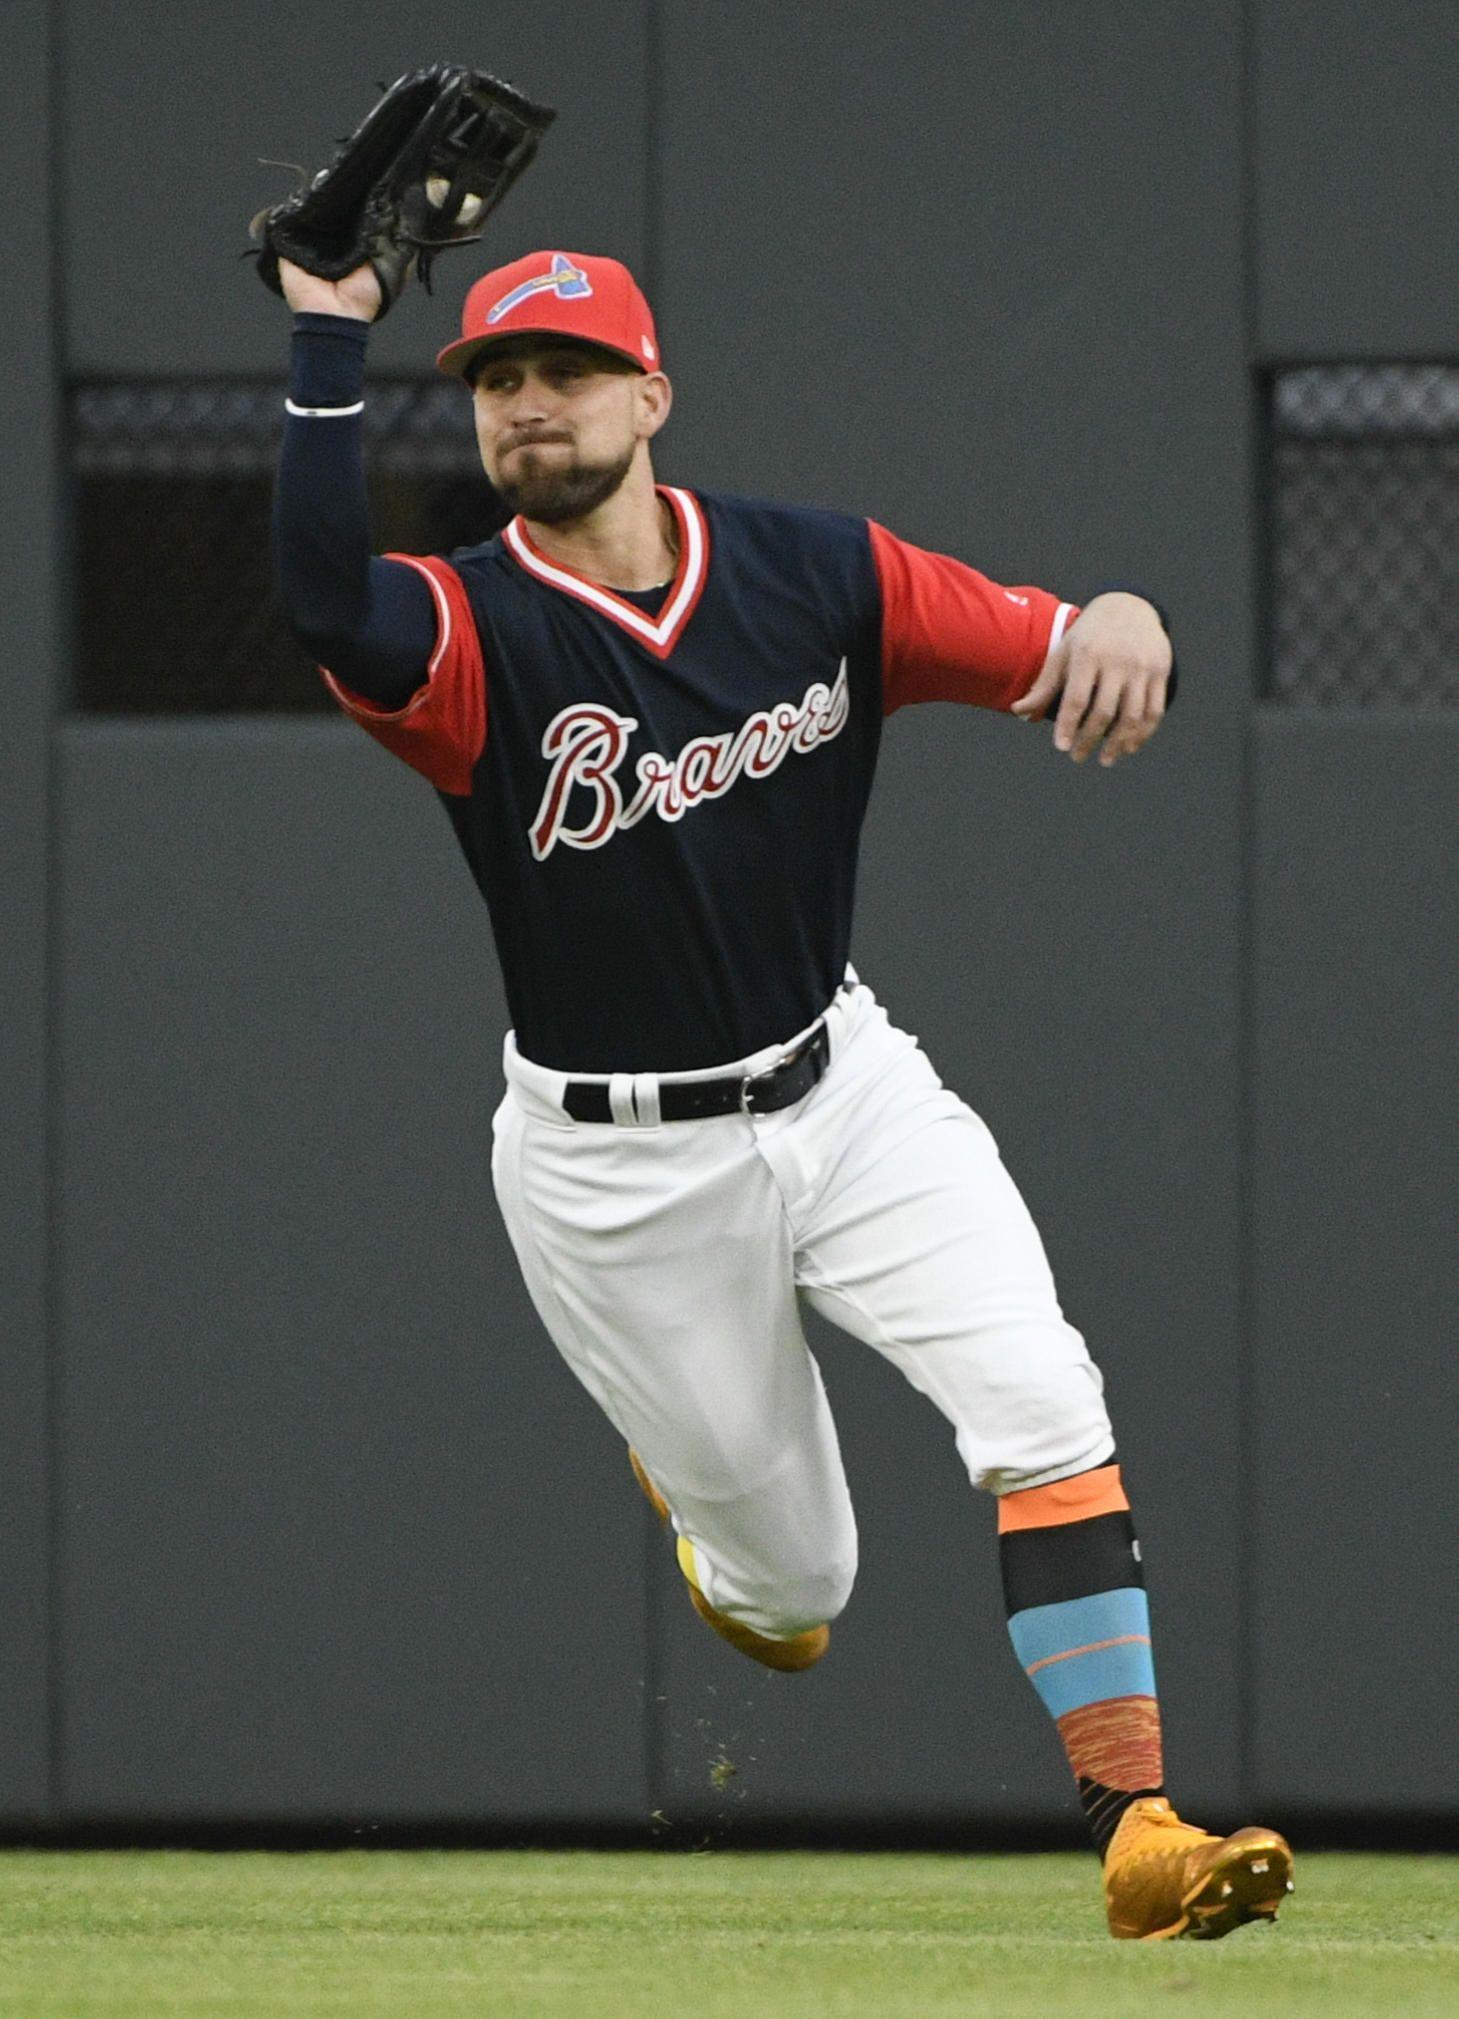 Atlanta Braves Center Fielder Ender Inciarte Catches A Fly Ball Hit By Colorado Rockies Gerardo Parra During The Atlanta Braves Braves Atlanta Braves Baseball